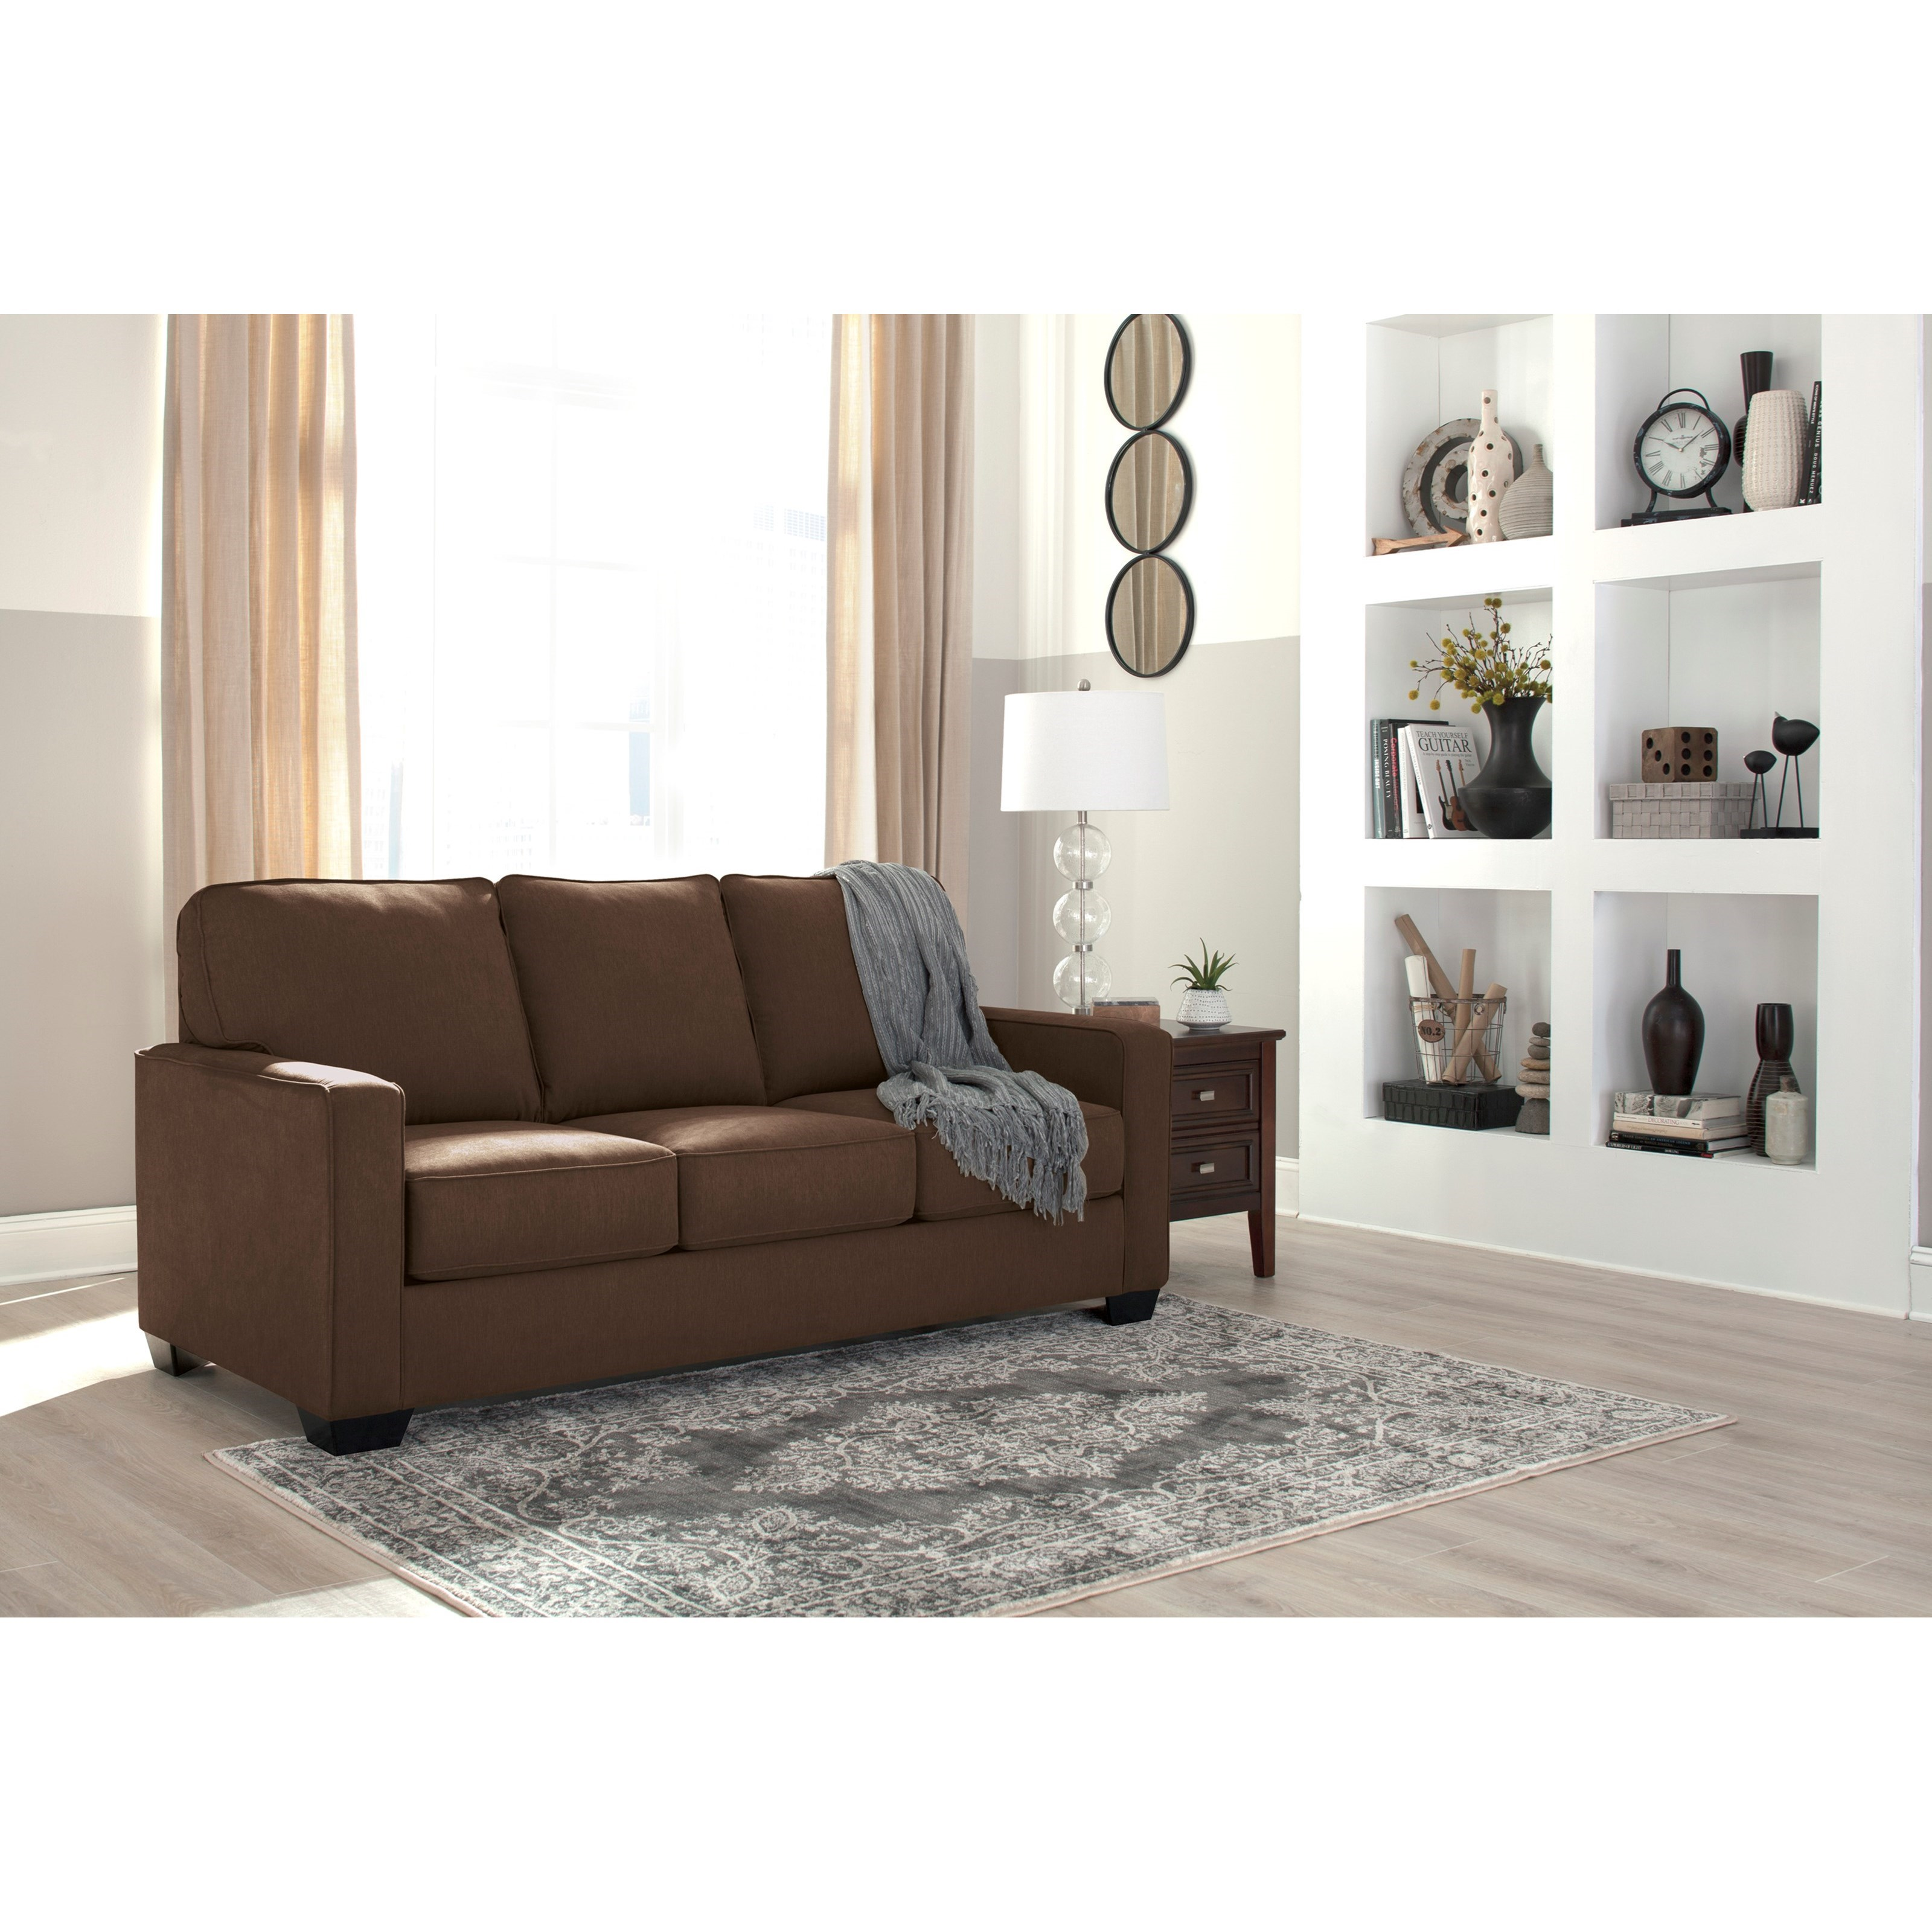 Signature Design By Ashley Zeb 3590336 Full Sofa Sleeper